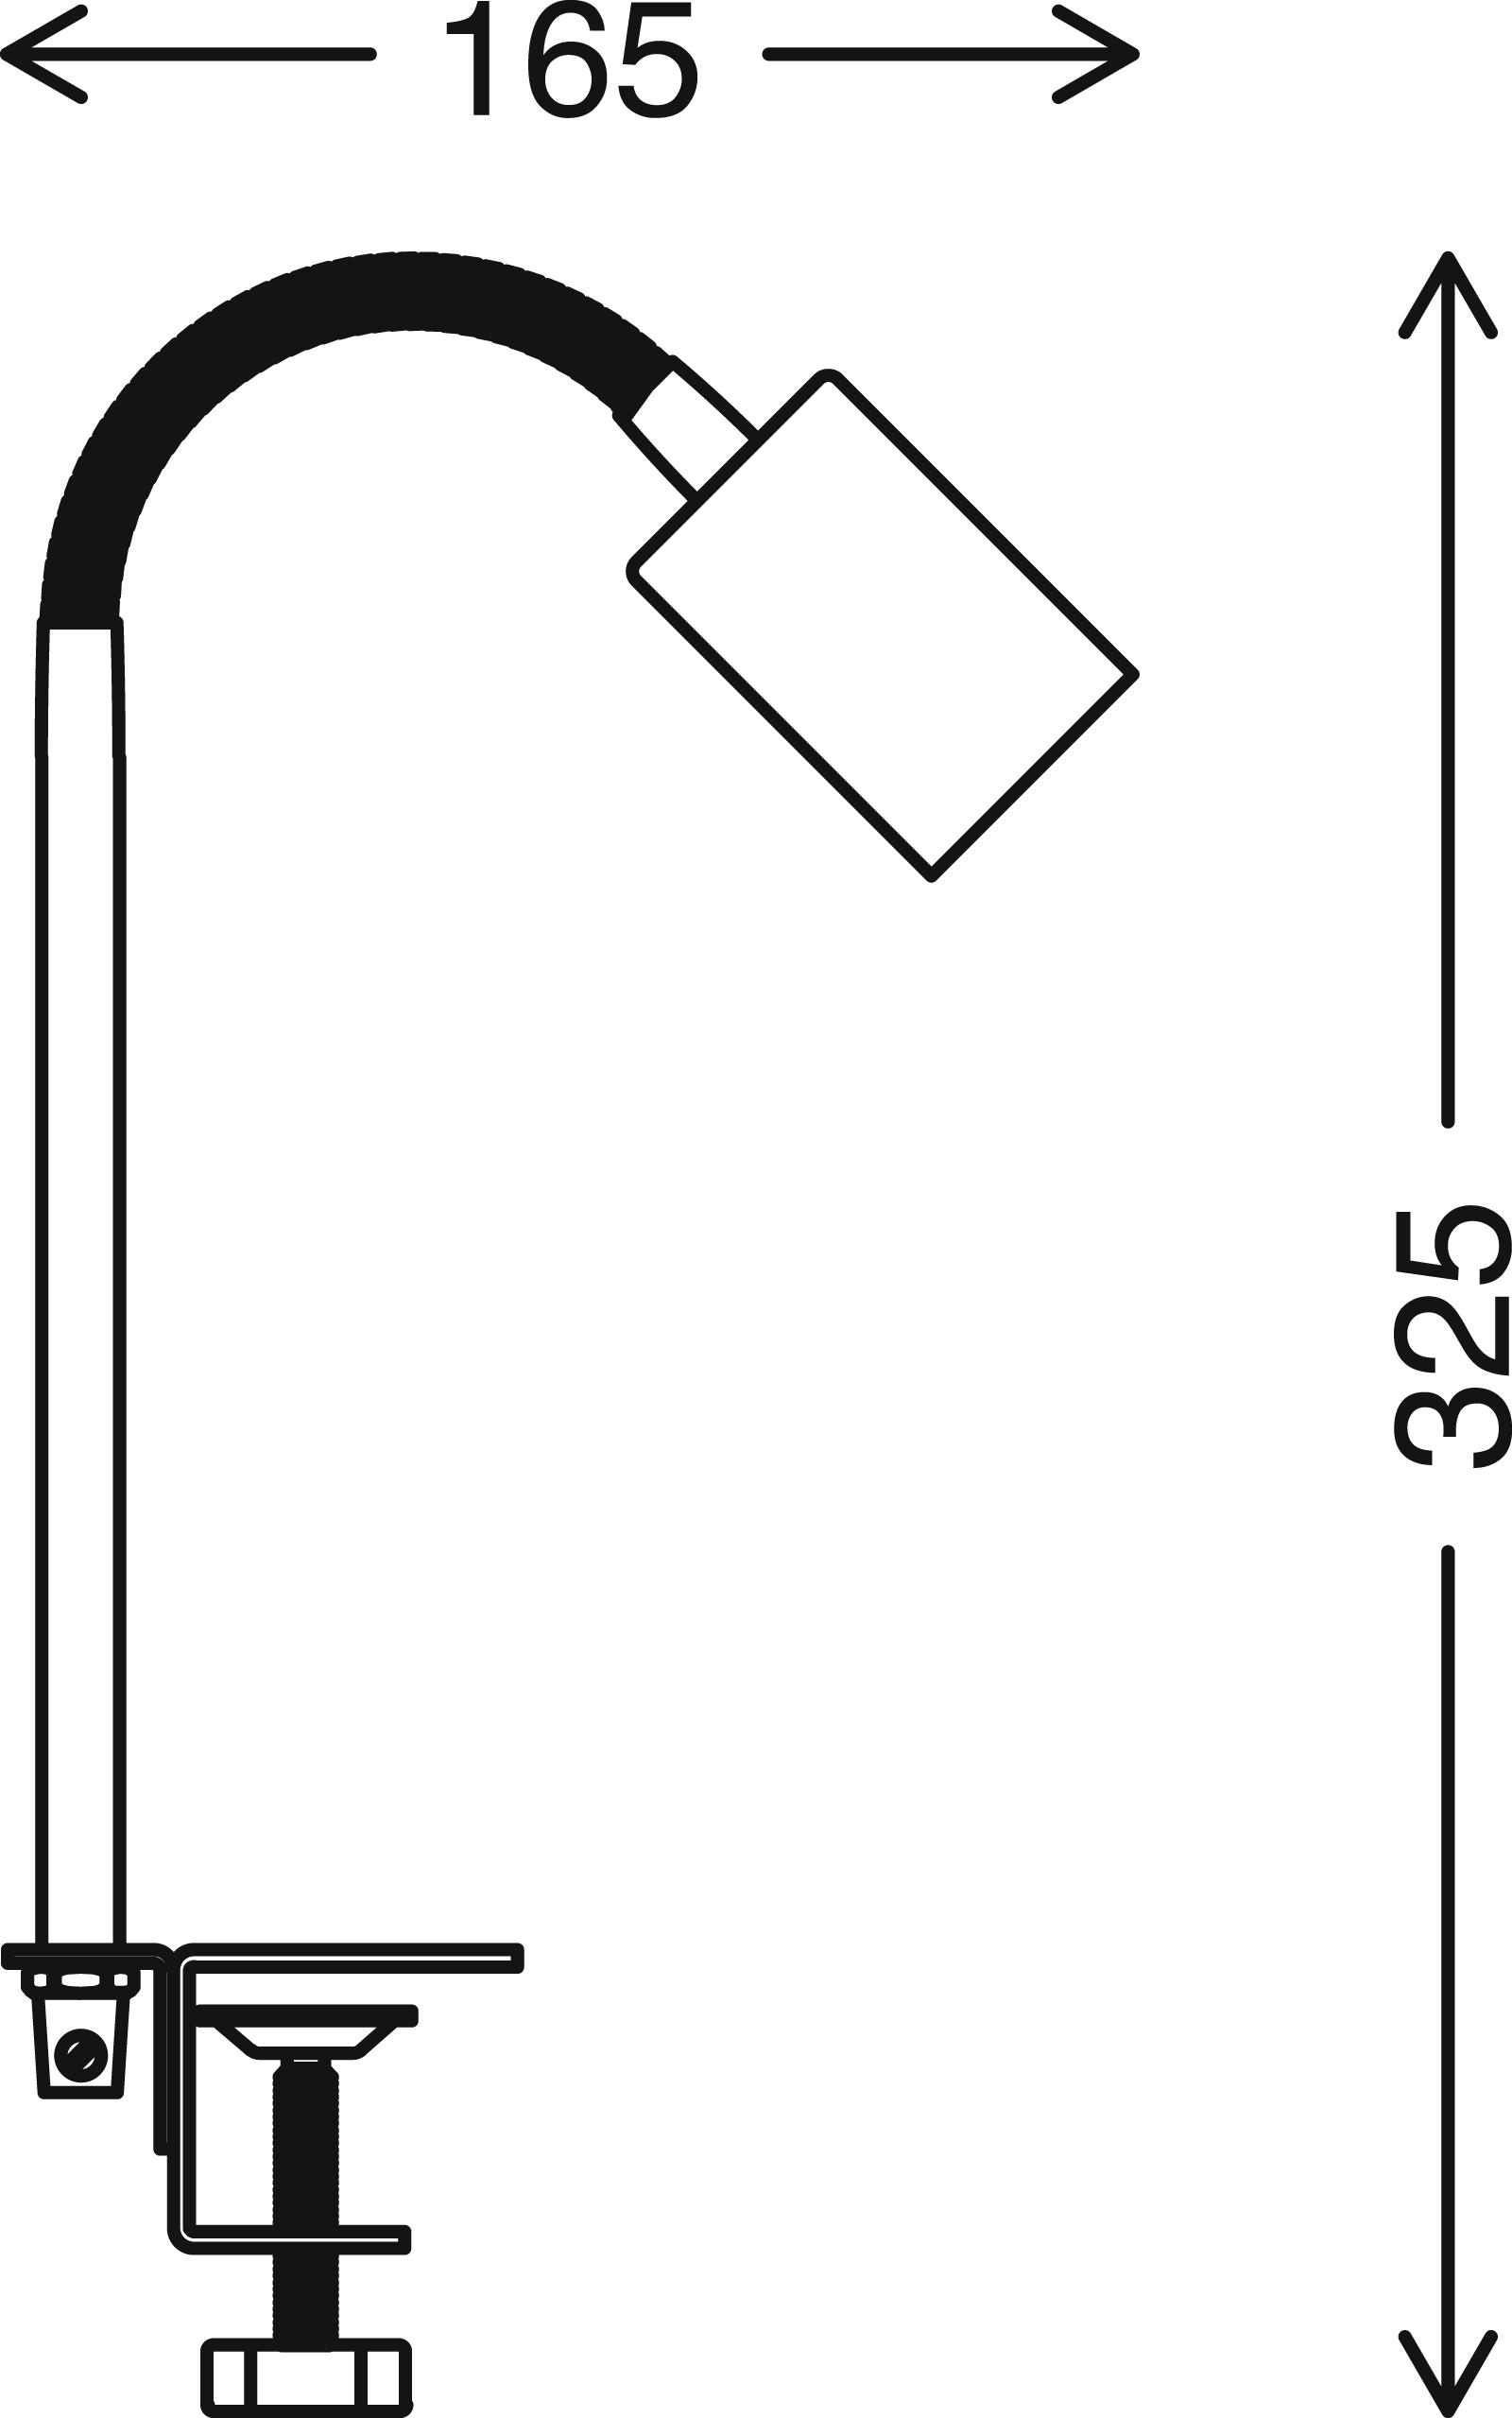 LED Klemmleuchte, 32,5 cm, max. 10 W, Schwarz